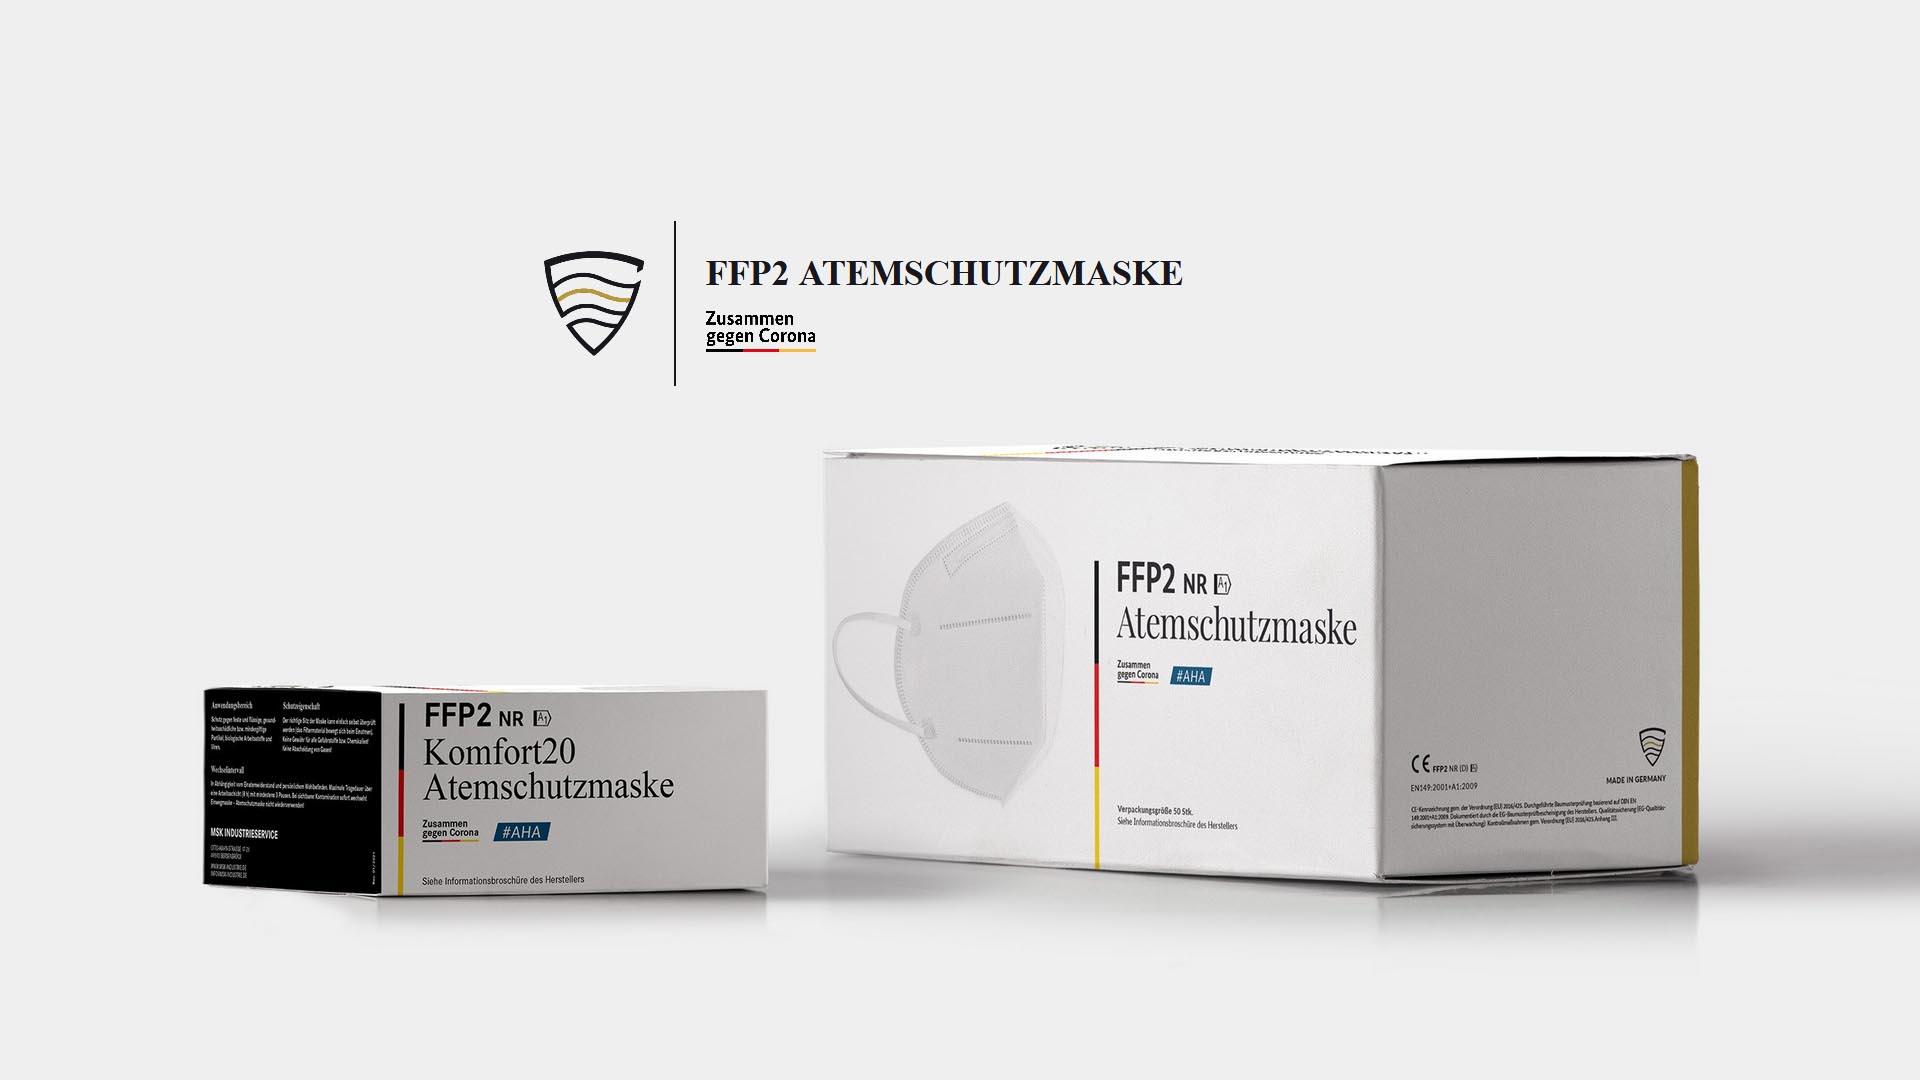 msk industrieservice atemschutzmasken ffp2 relaunch 3